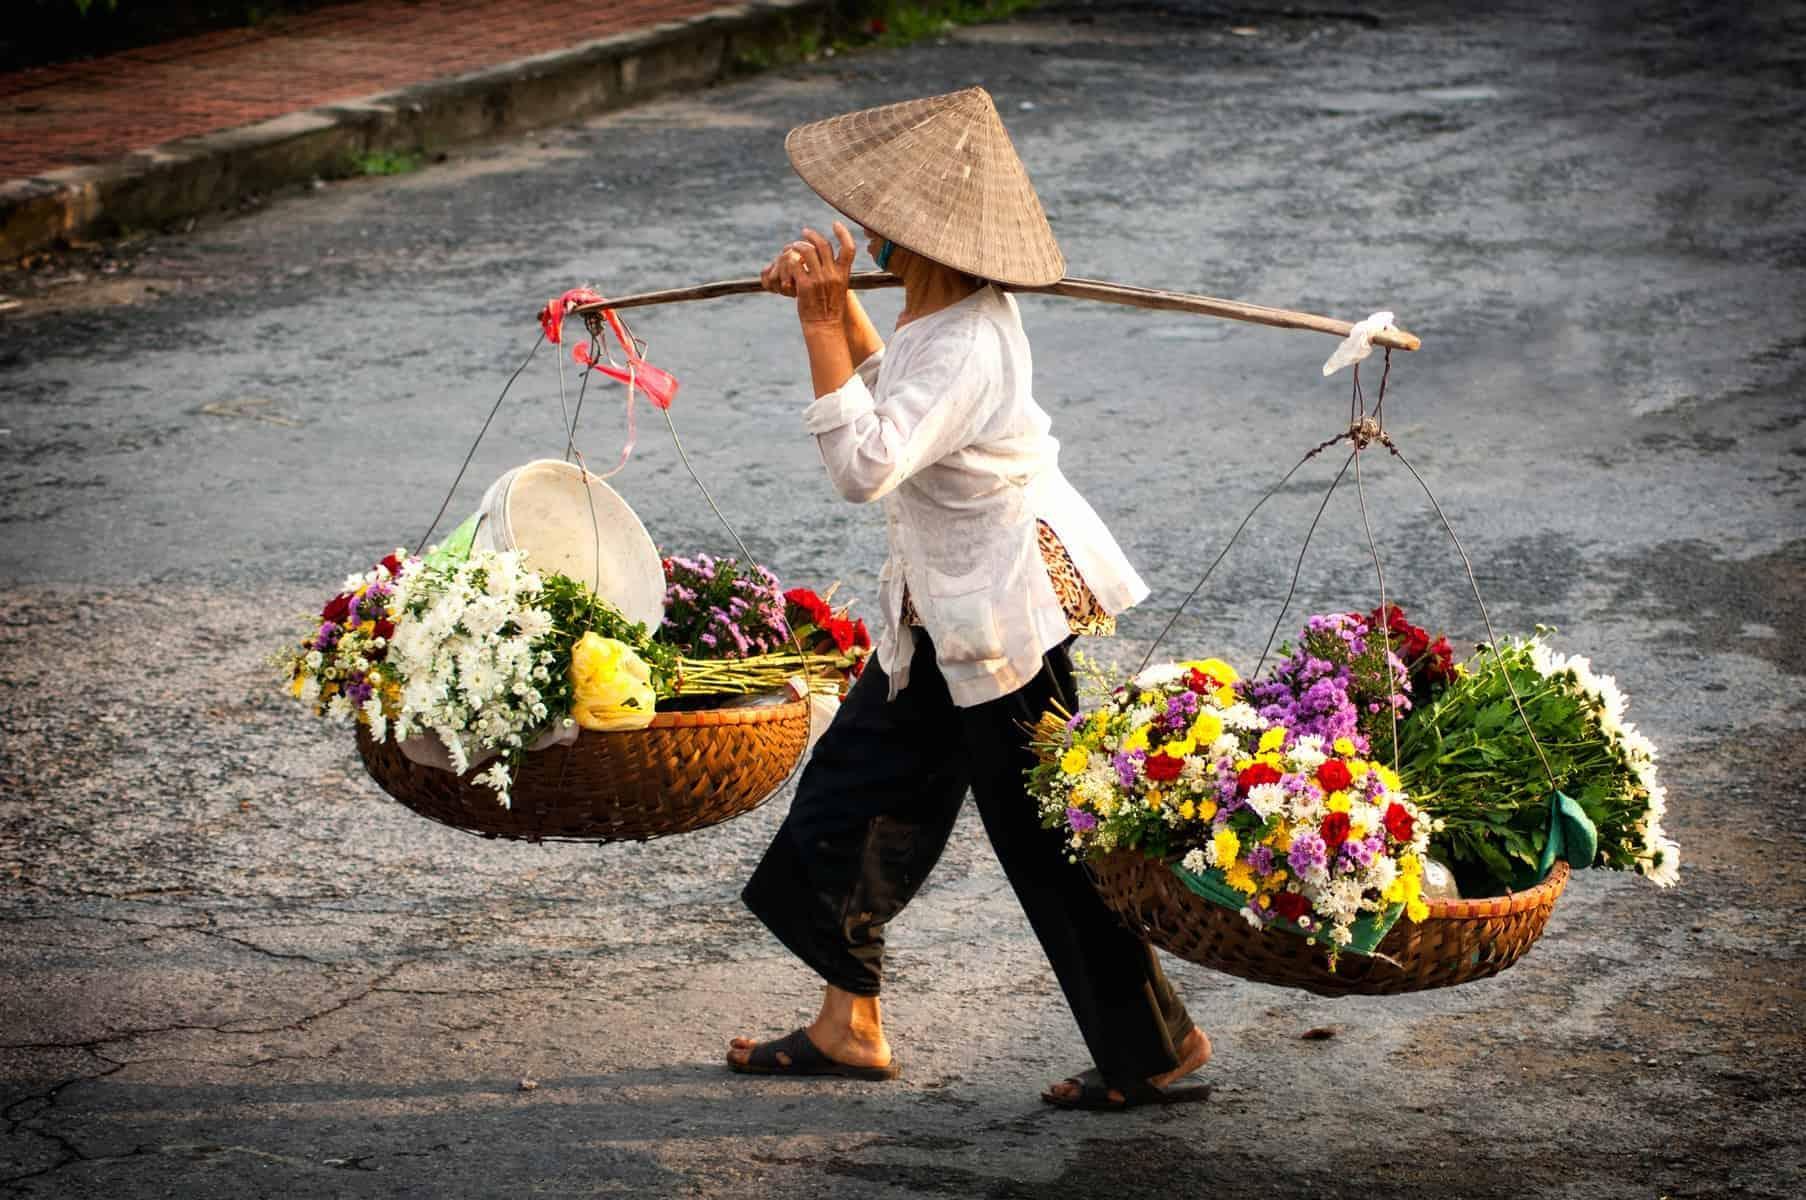 Hanoi florist vendor on Hanoi street, Vietnam